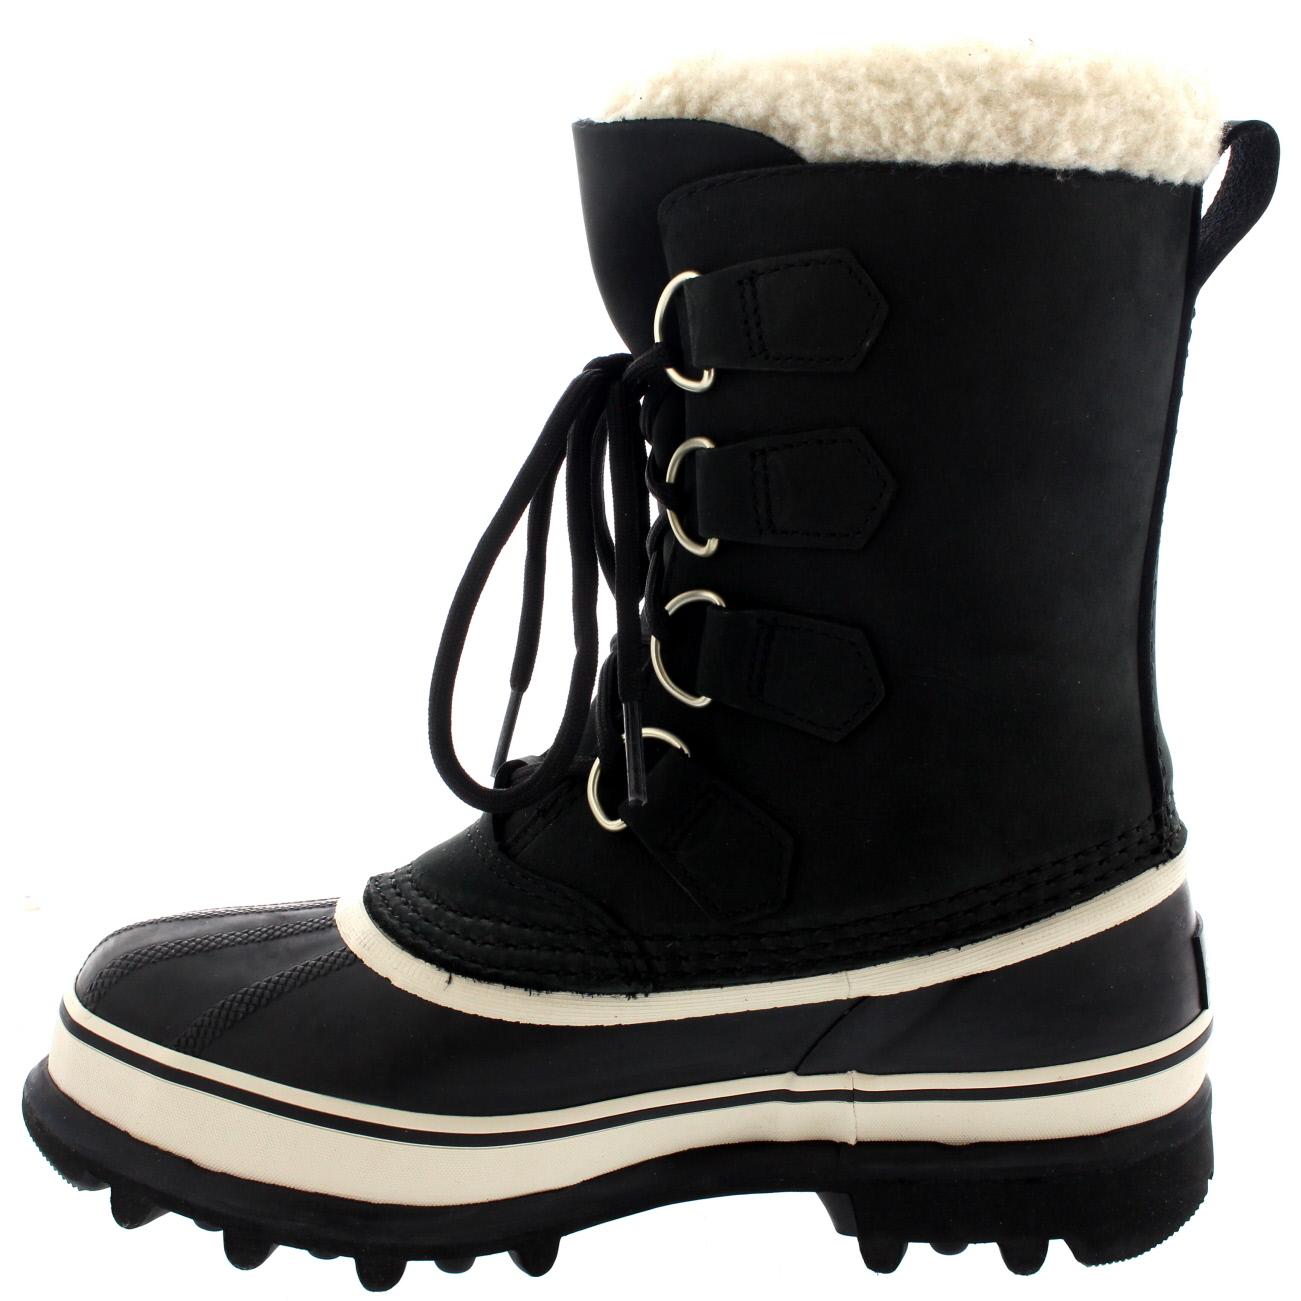 Womens Sorel Caribou Snow Waterproof Winter Fur Lined Mid Calf Rain ... 4dcd7281e7